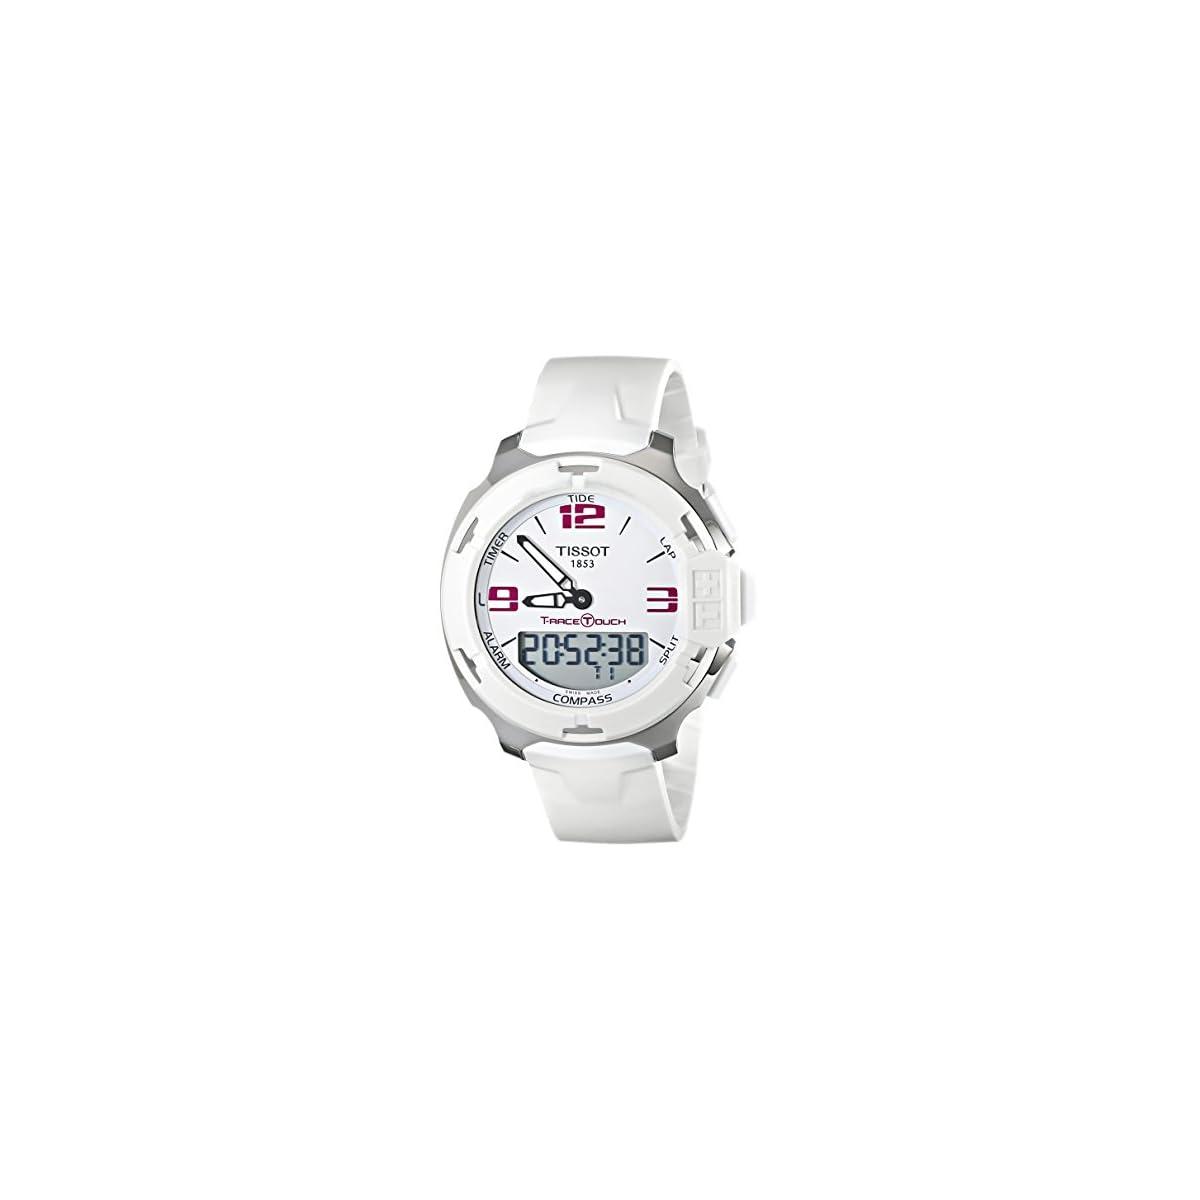 41NtCfZvz1L. SS1200  - Tissot Reloj para Unisex de con Correa en Goma TIST0814201701700